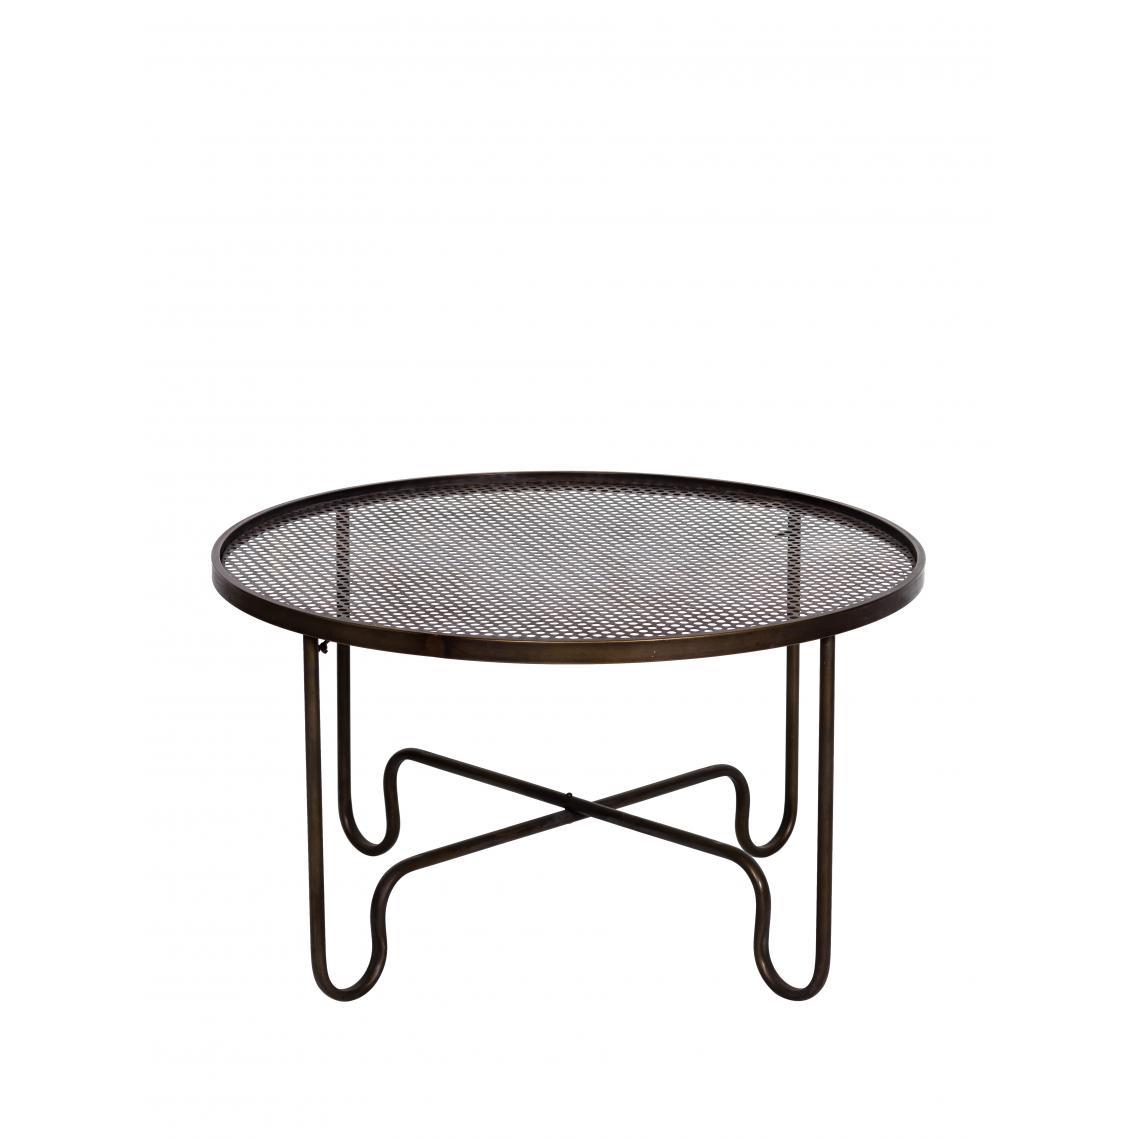 Chehoma Table basse rond plateau grillagé RETO